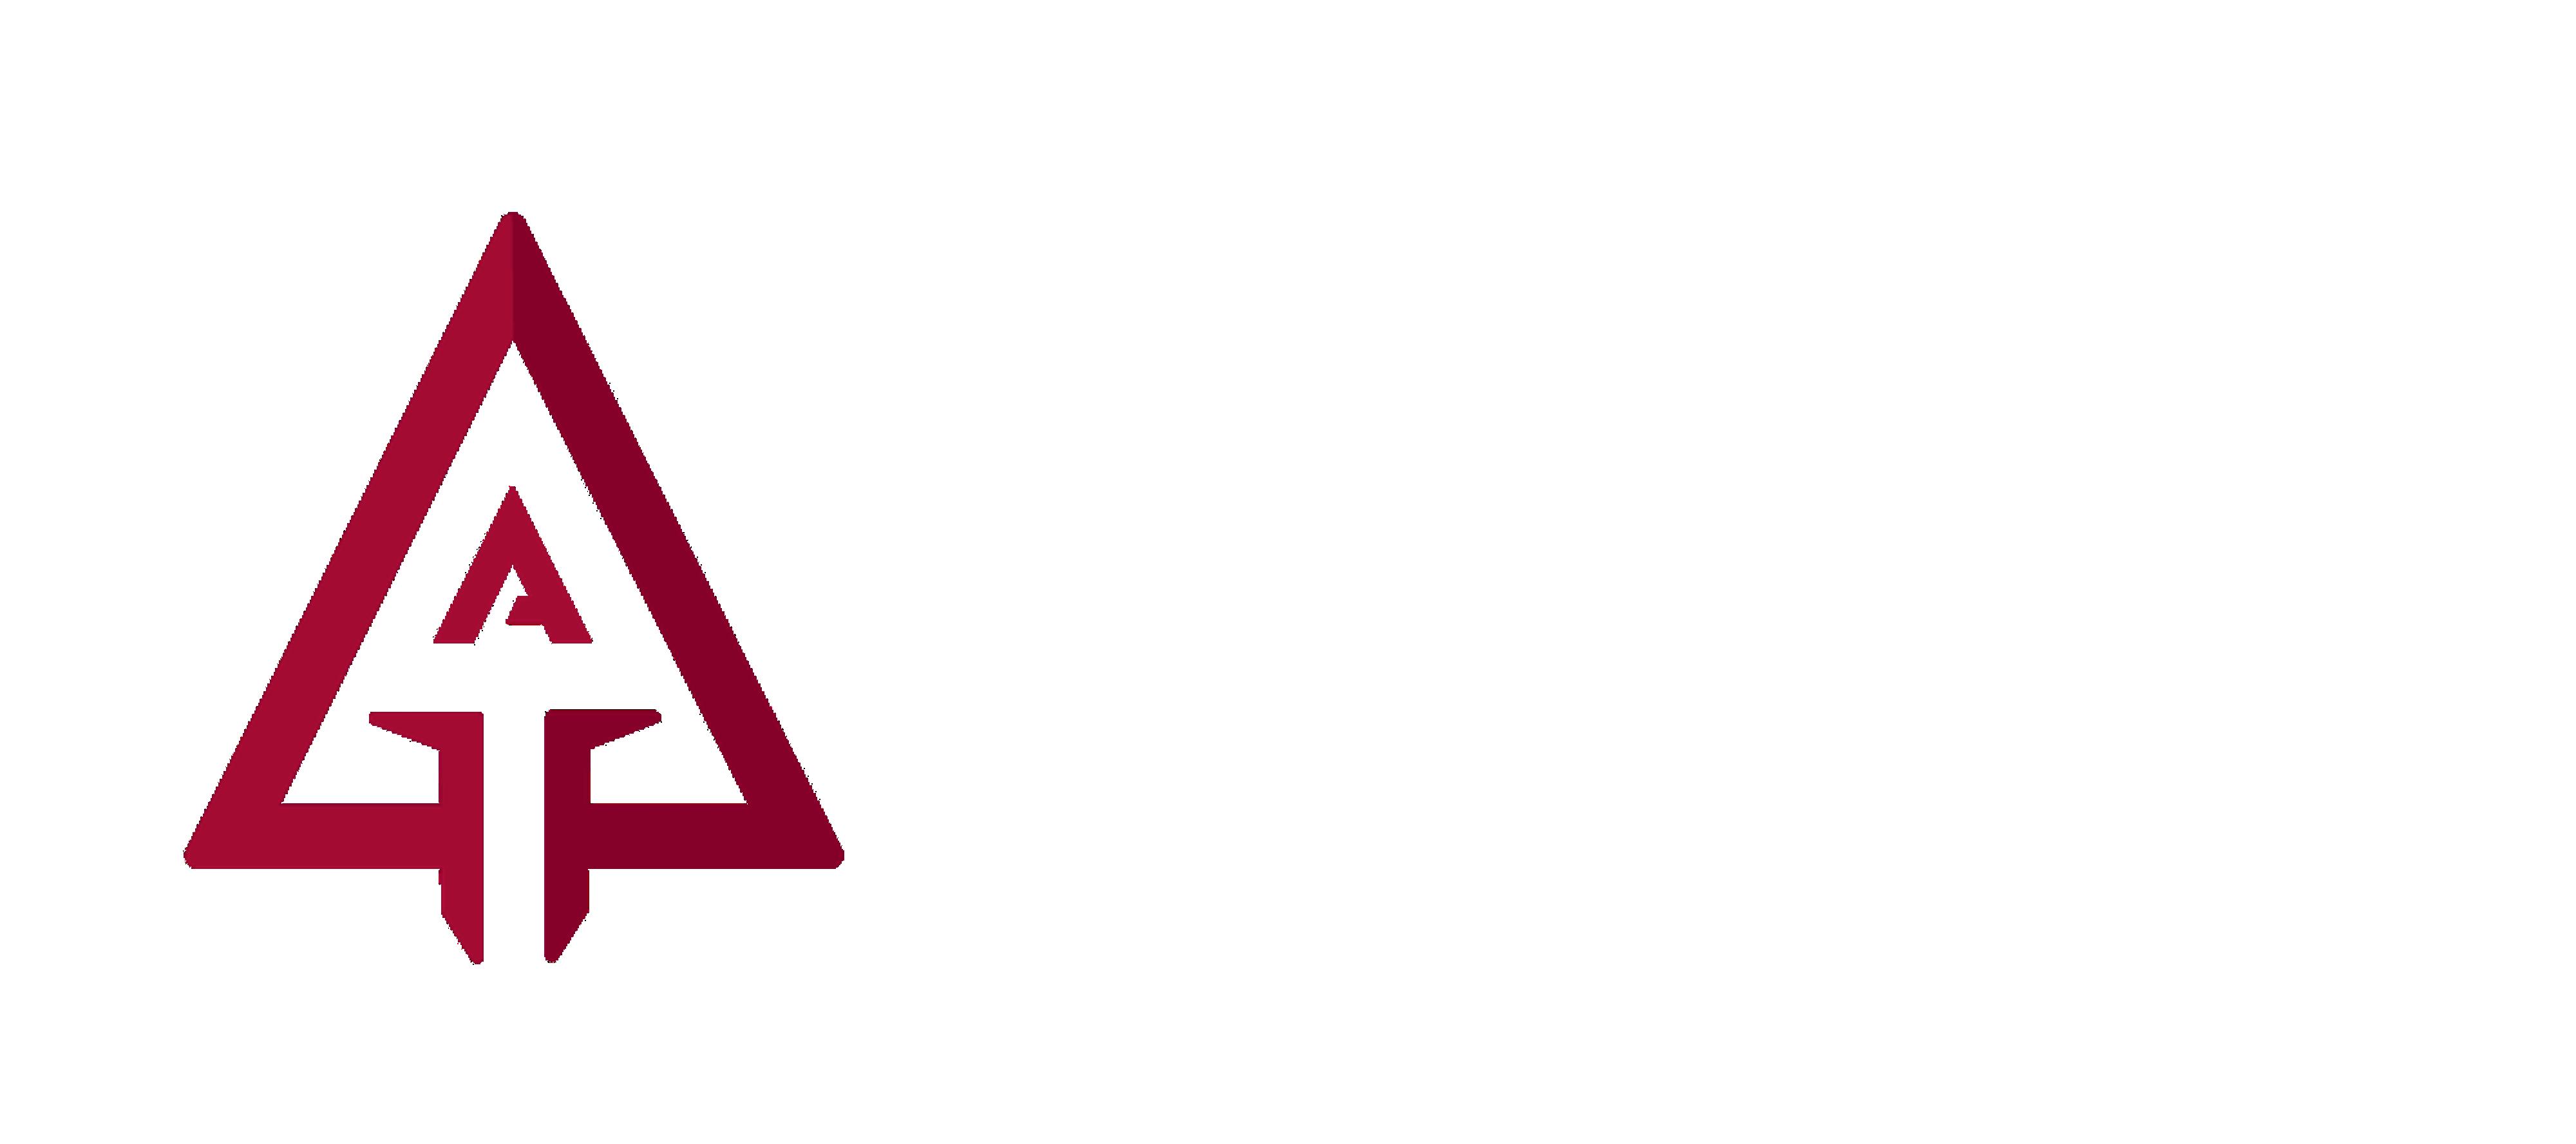 ATA Archery Trade Association